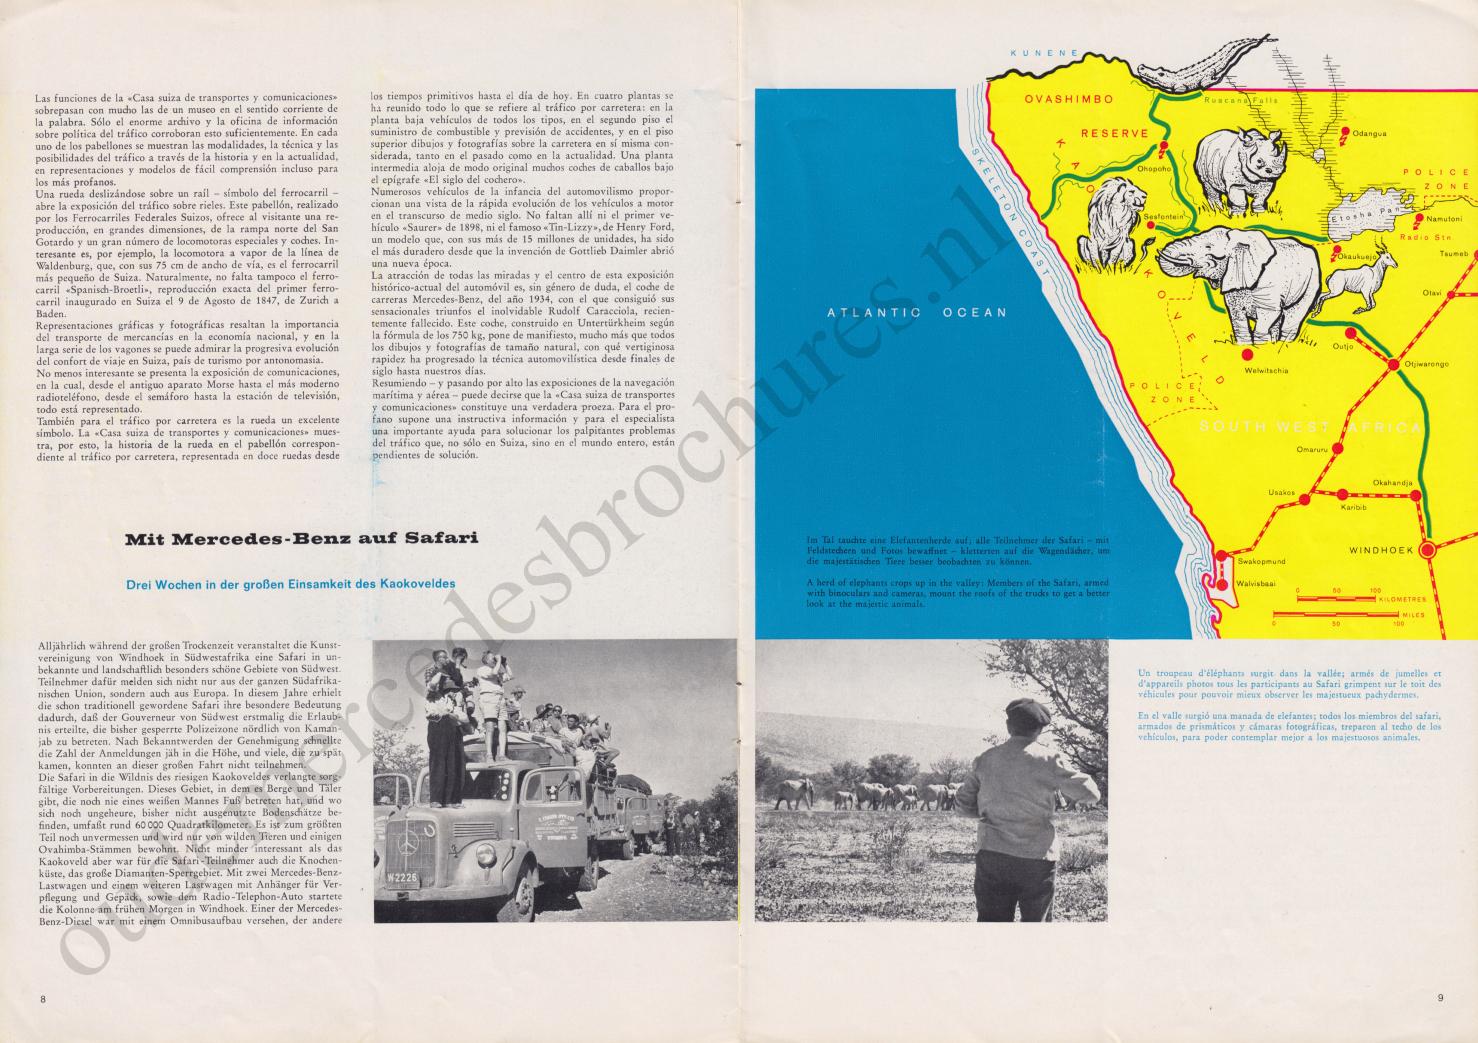 (REVISTA): Periódico In aller welt n.º 37 - Mercedes-Benz no mundo - 1959 - multilingue 005